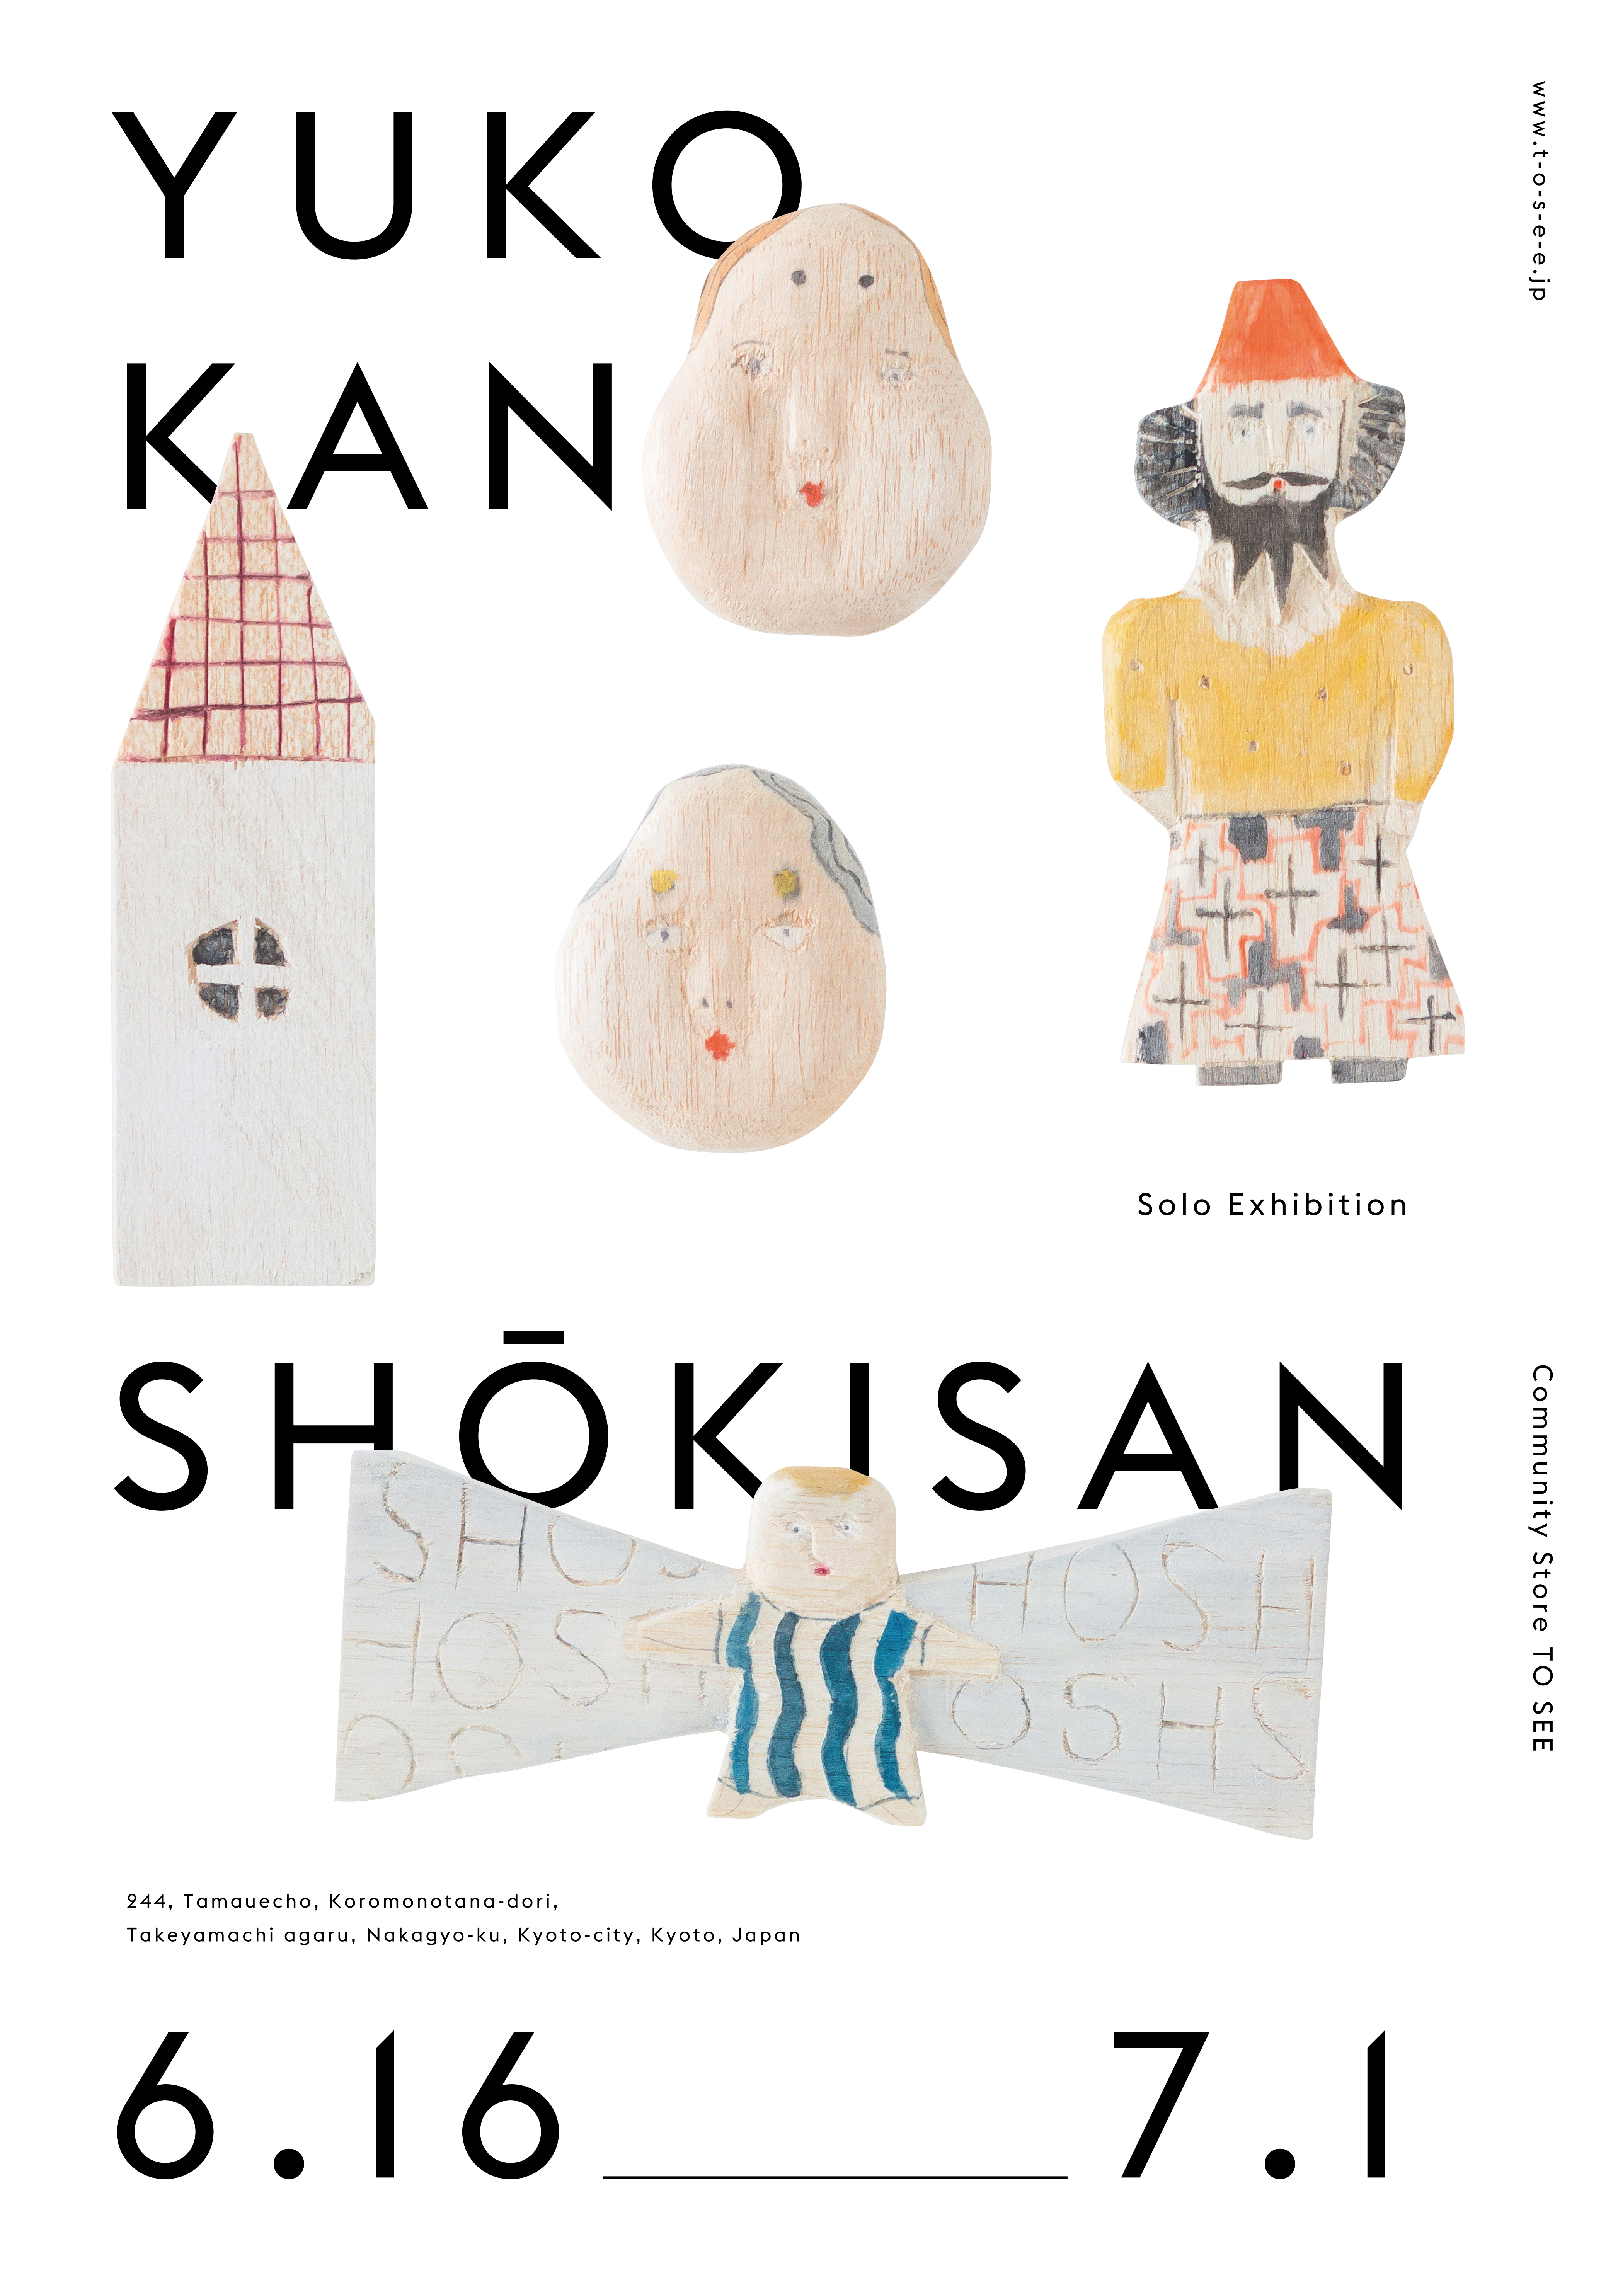 Yuko Kan Solo exhibition 「SHOKISAN」